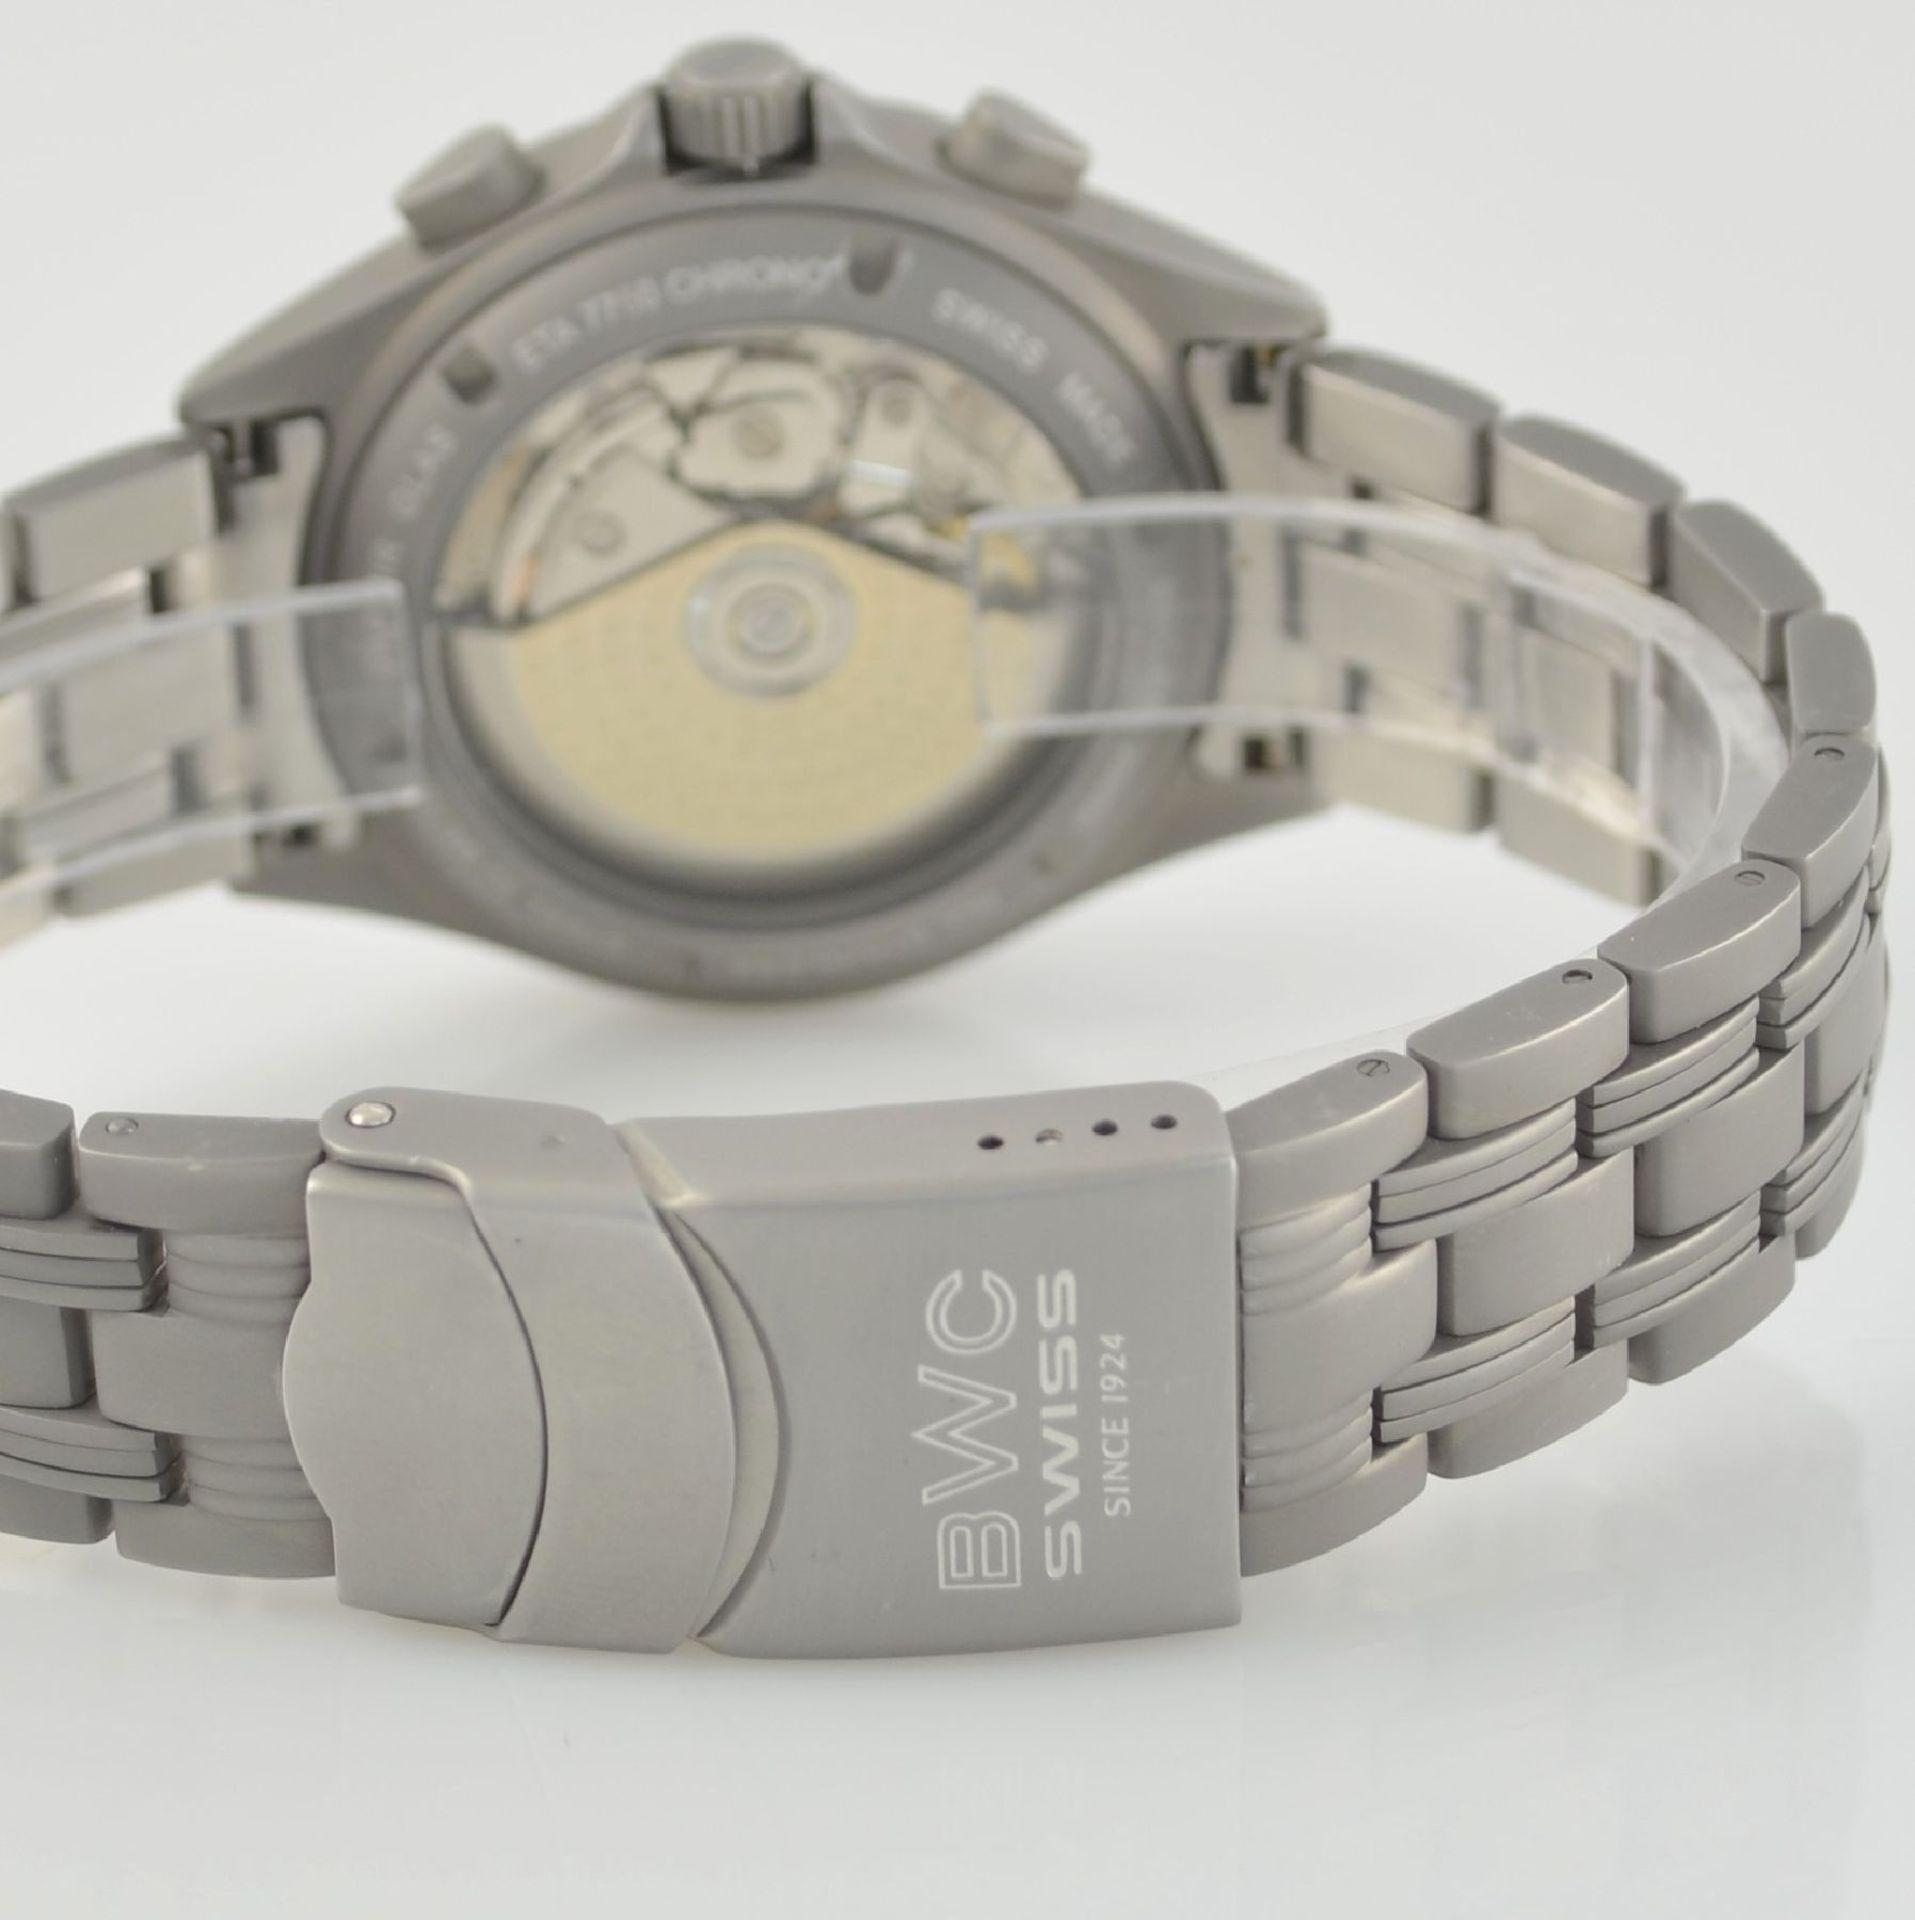 BWC Armbandchronograph, Automatik, Schweiz um 2010, matt. Edelstahlgeh. inkl. orig. Gliederband m. - Bild 5 aus 7